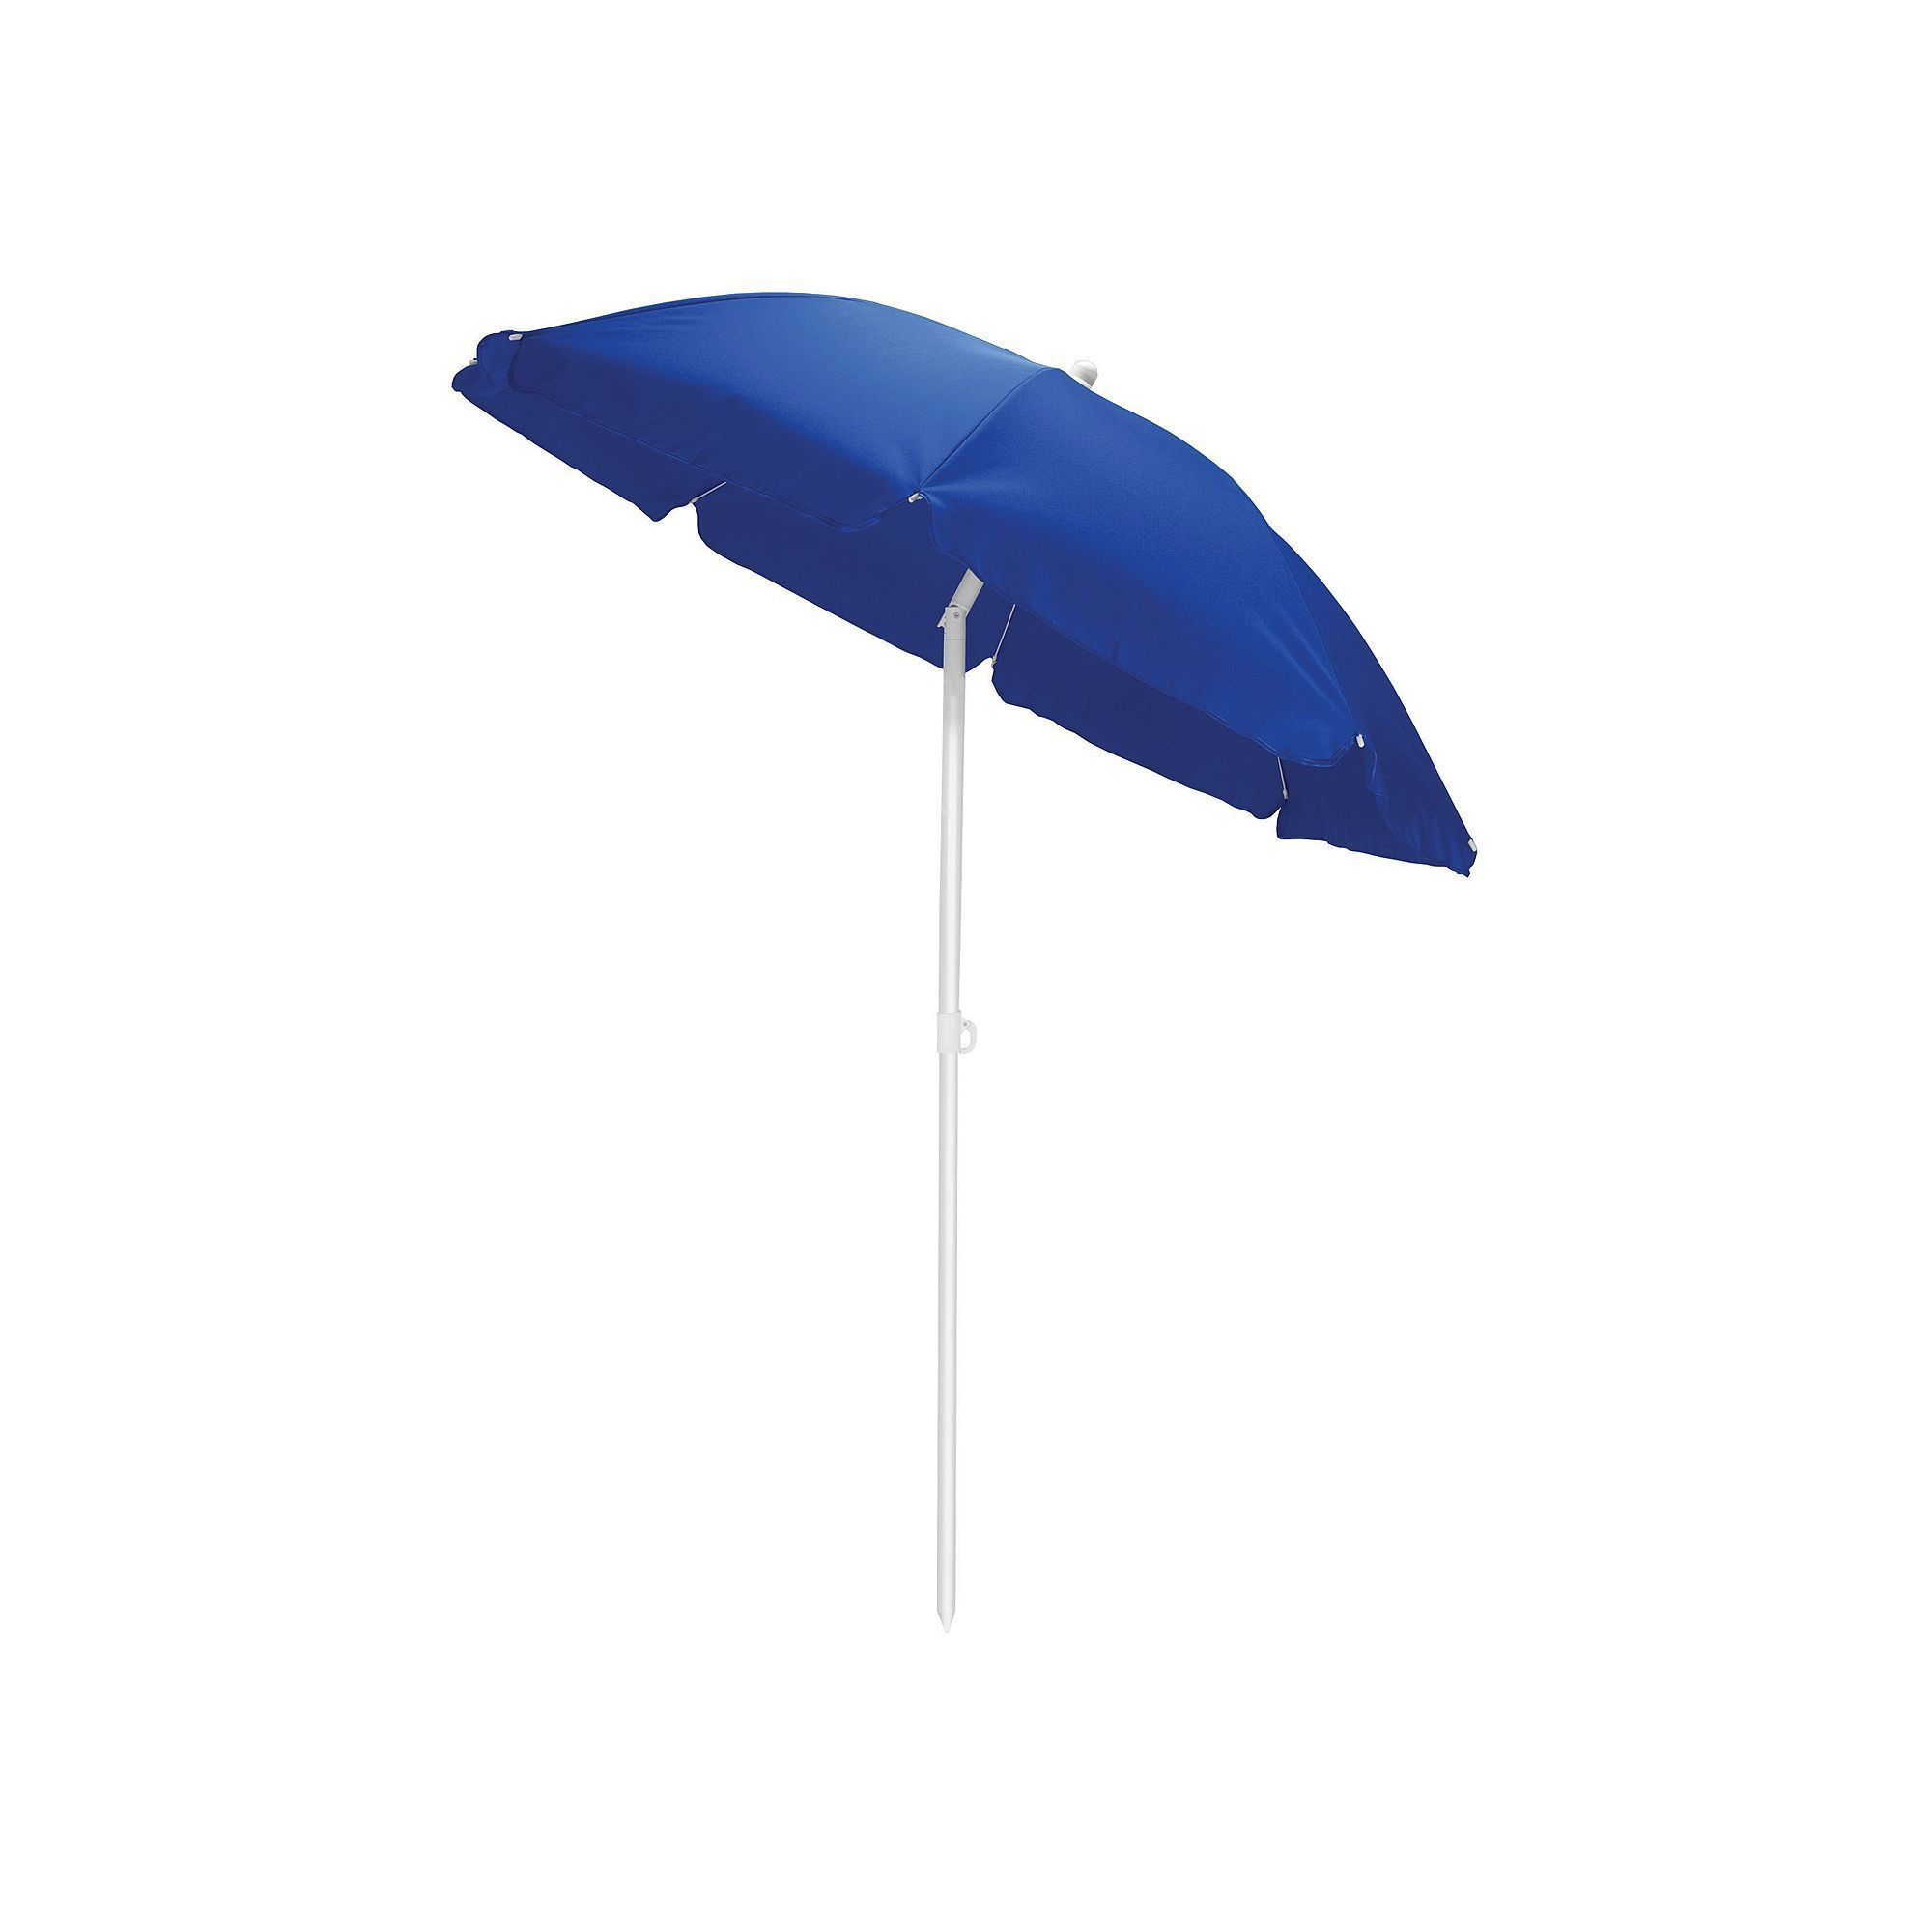 Patio Regarding Alyson Joeshade Beach Umbrellas (View 17 of 20)